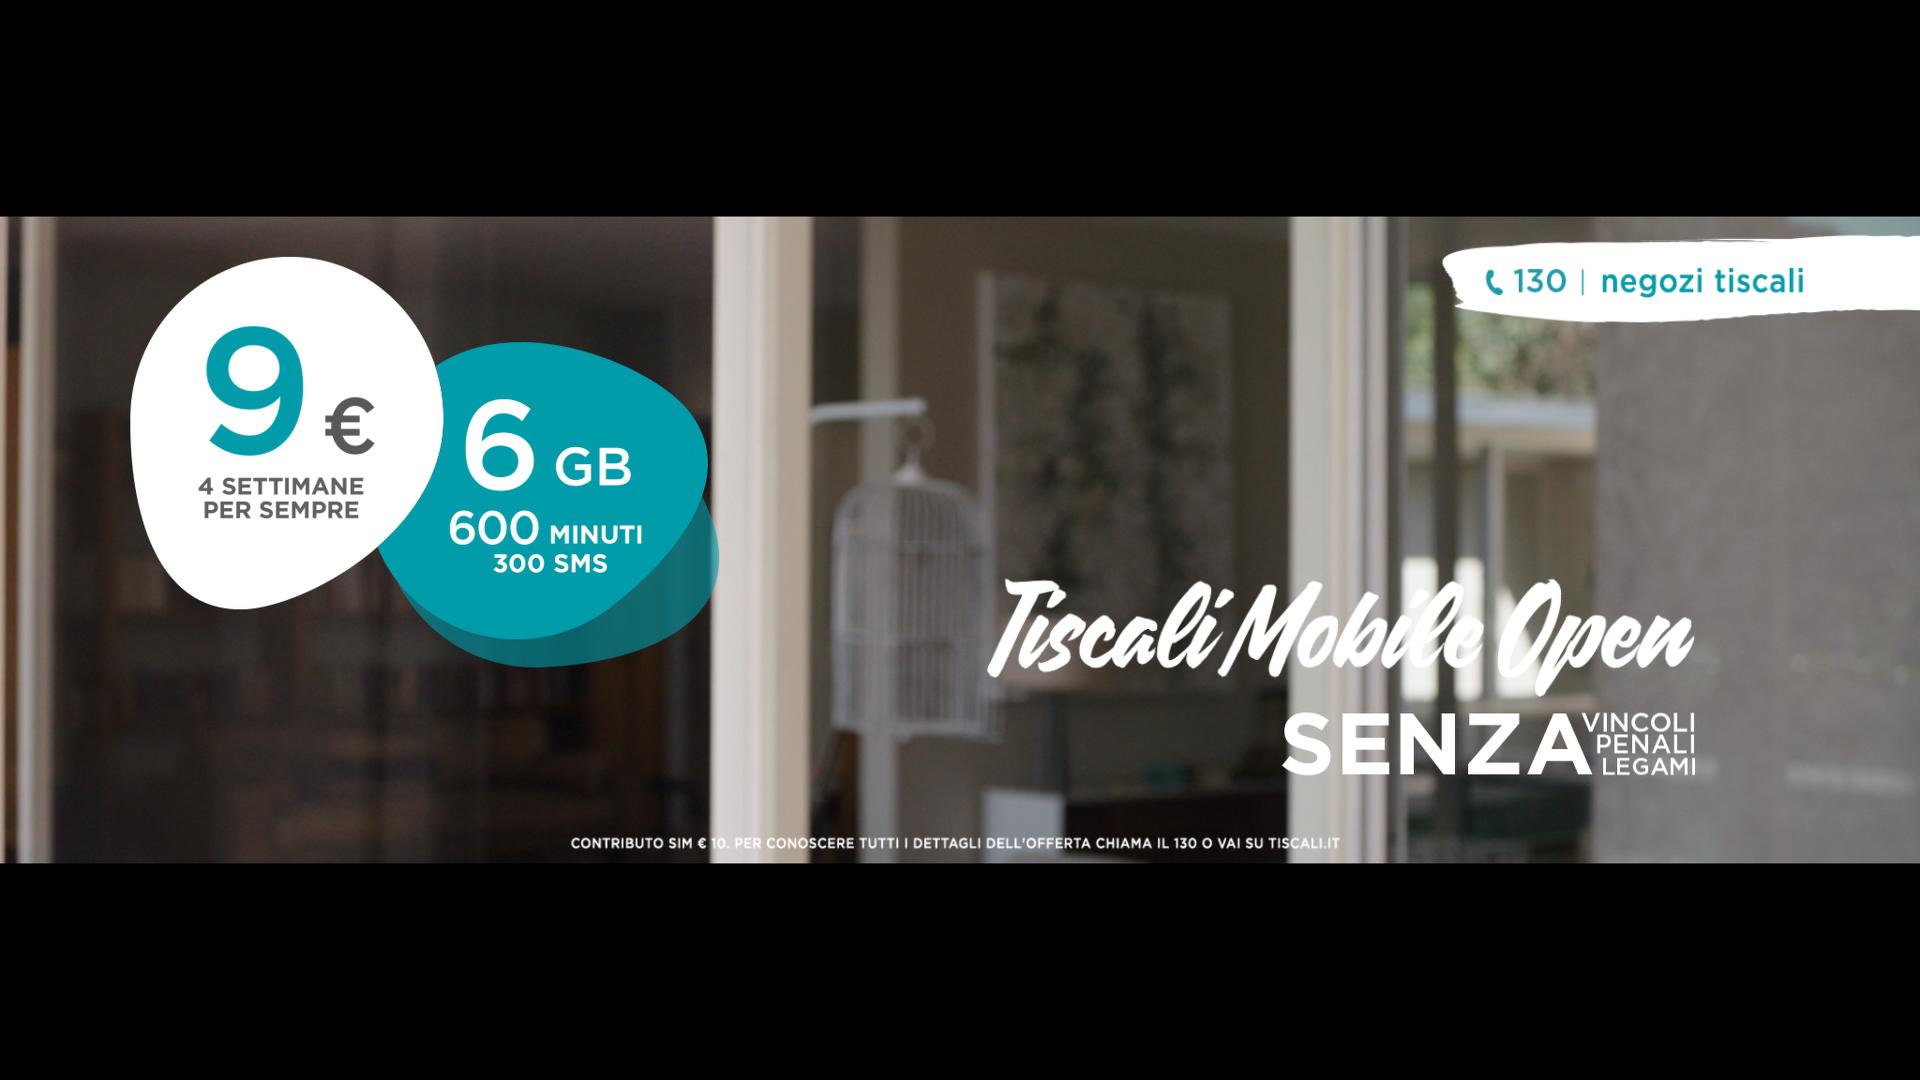 Tiscali Mobile Open